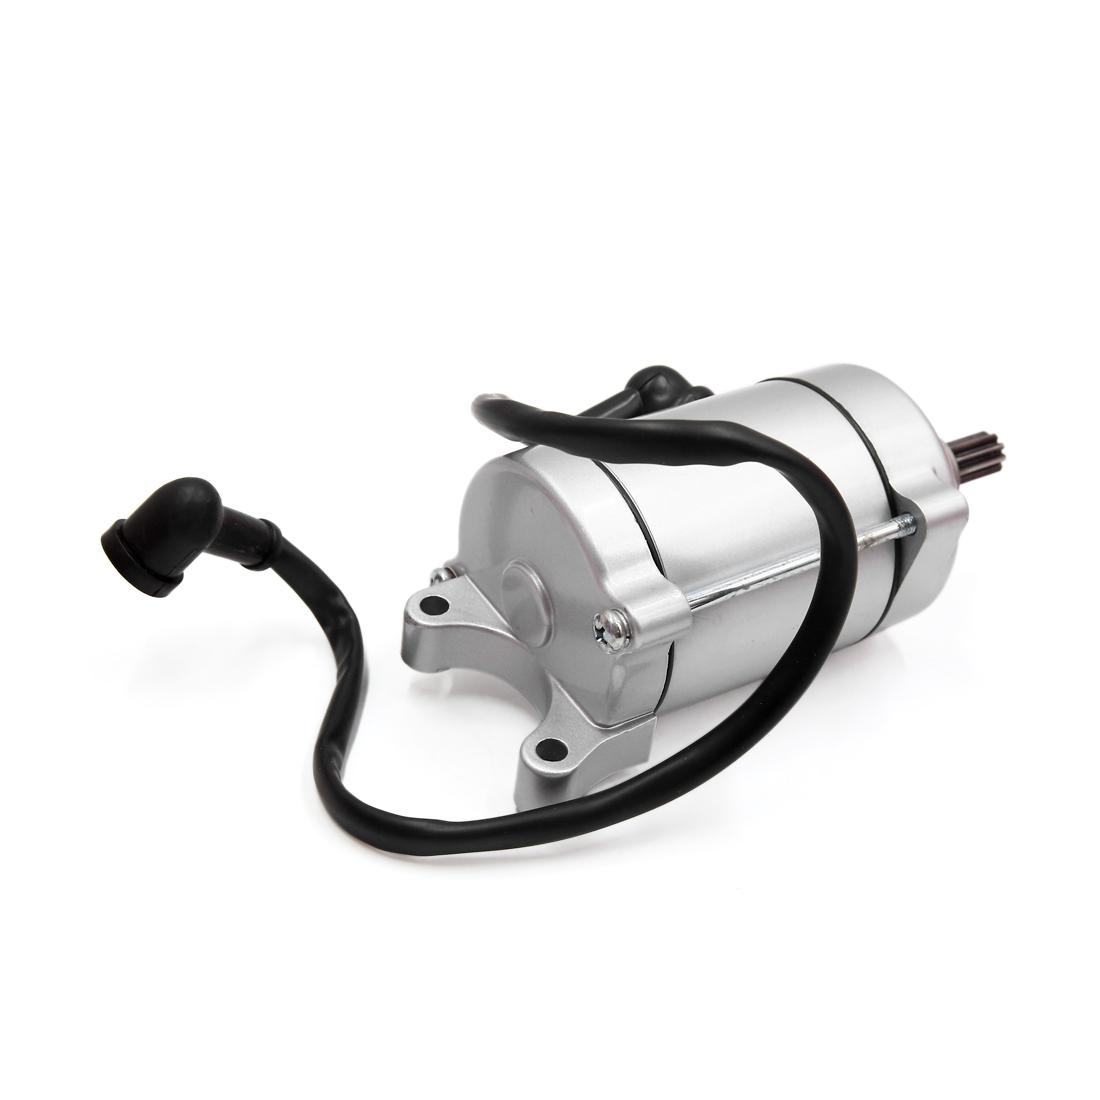 Silver Tone Metal Motorcycle Motorbike Engine Power Starter Motor for CG-125 - image 2 de 3